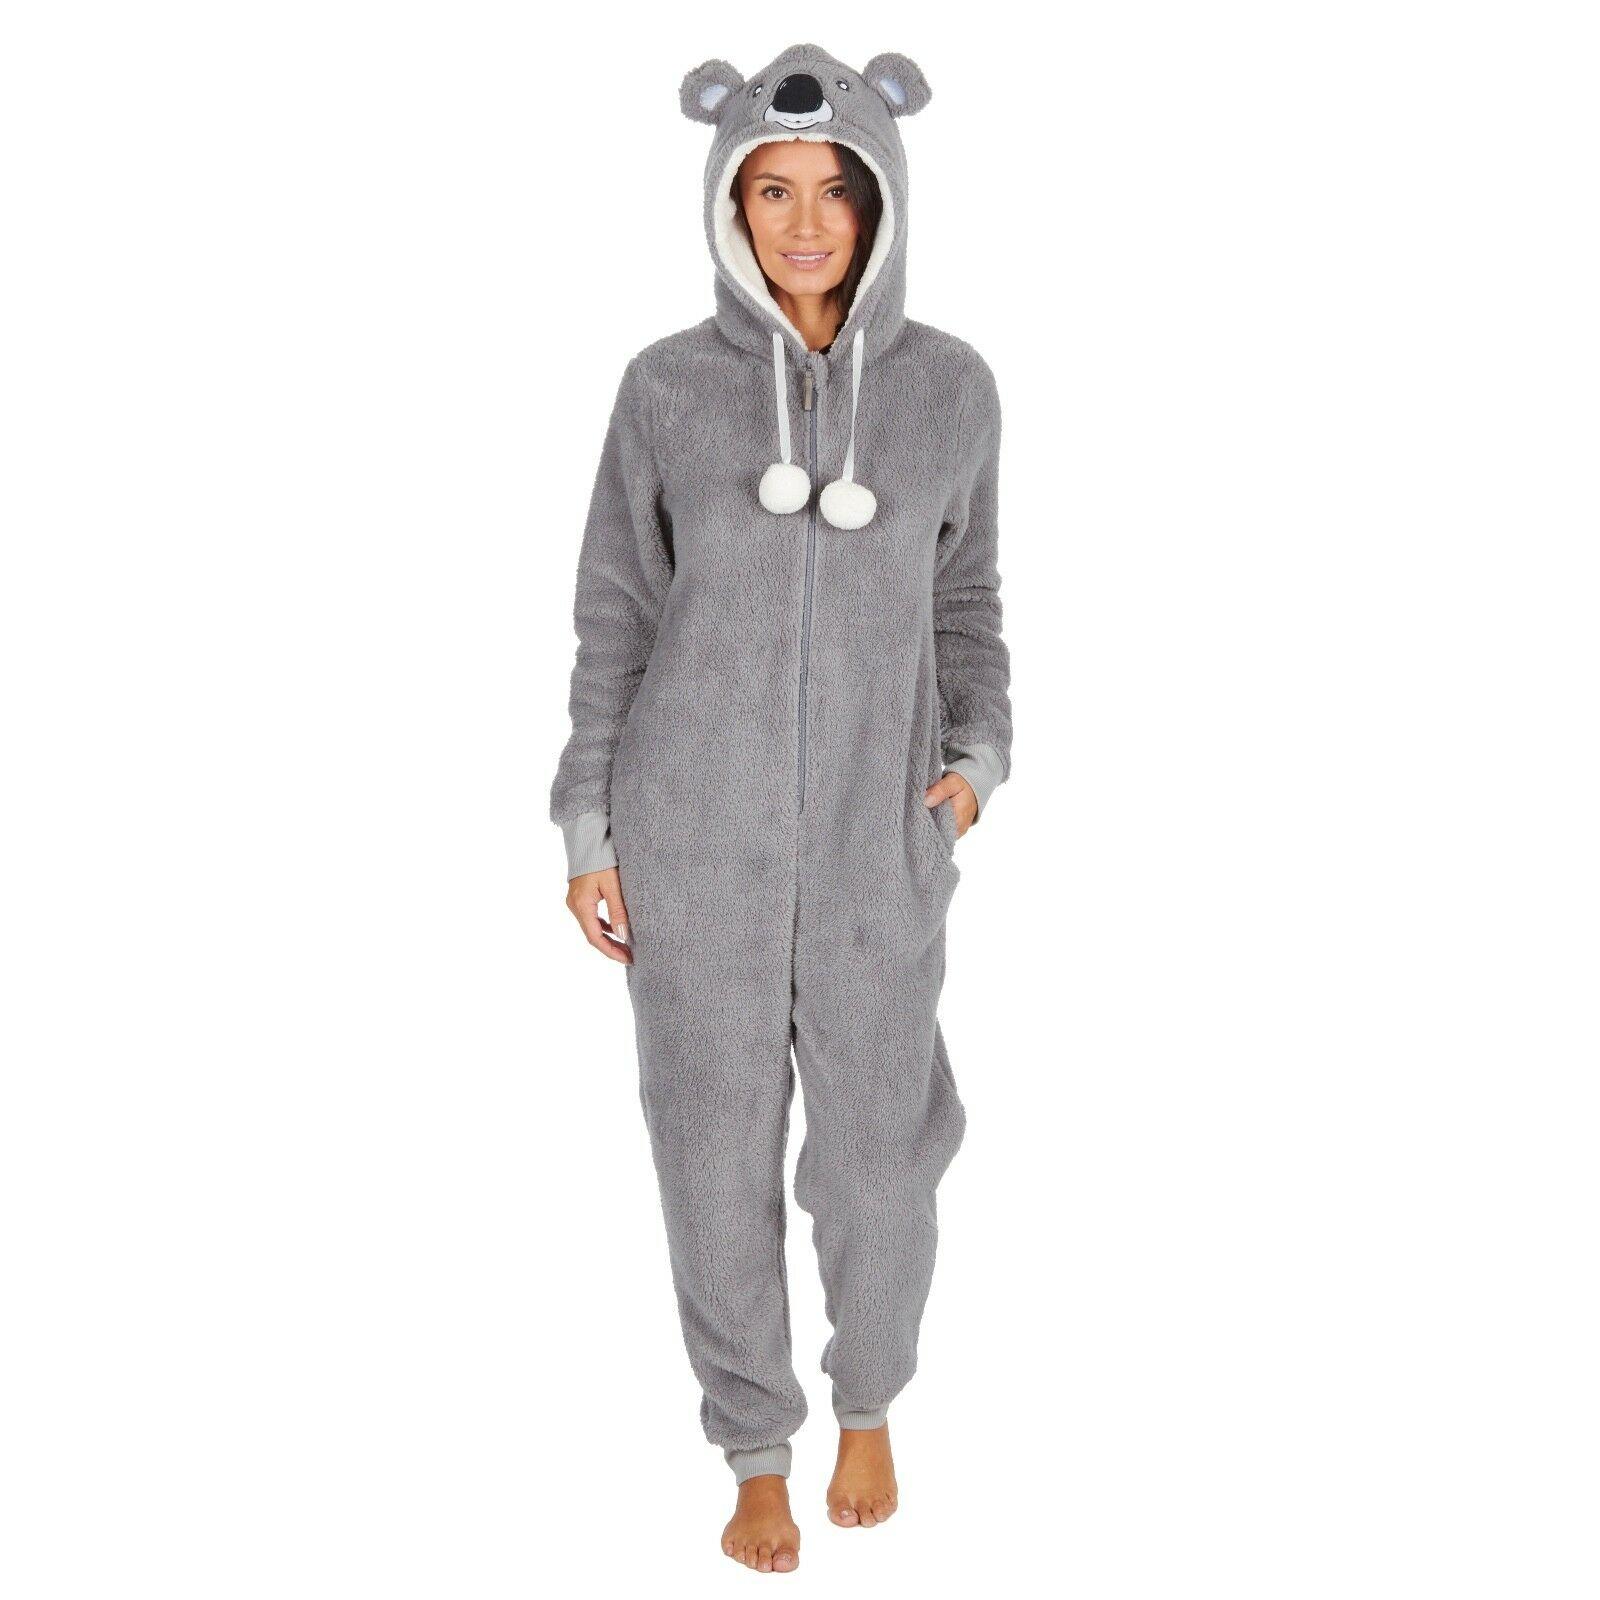 Details over Ladies Girls 1Onesie Hooded All in One Pyjamas Novelty Animal Fleece Zip Pajama